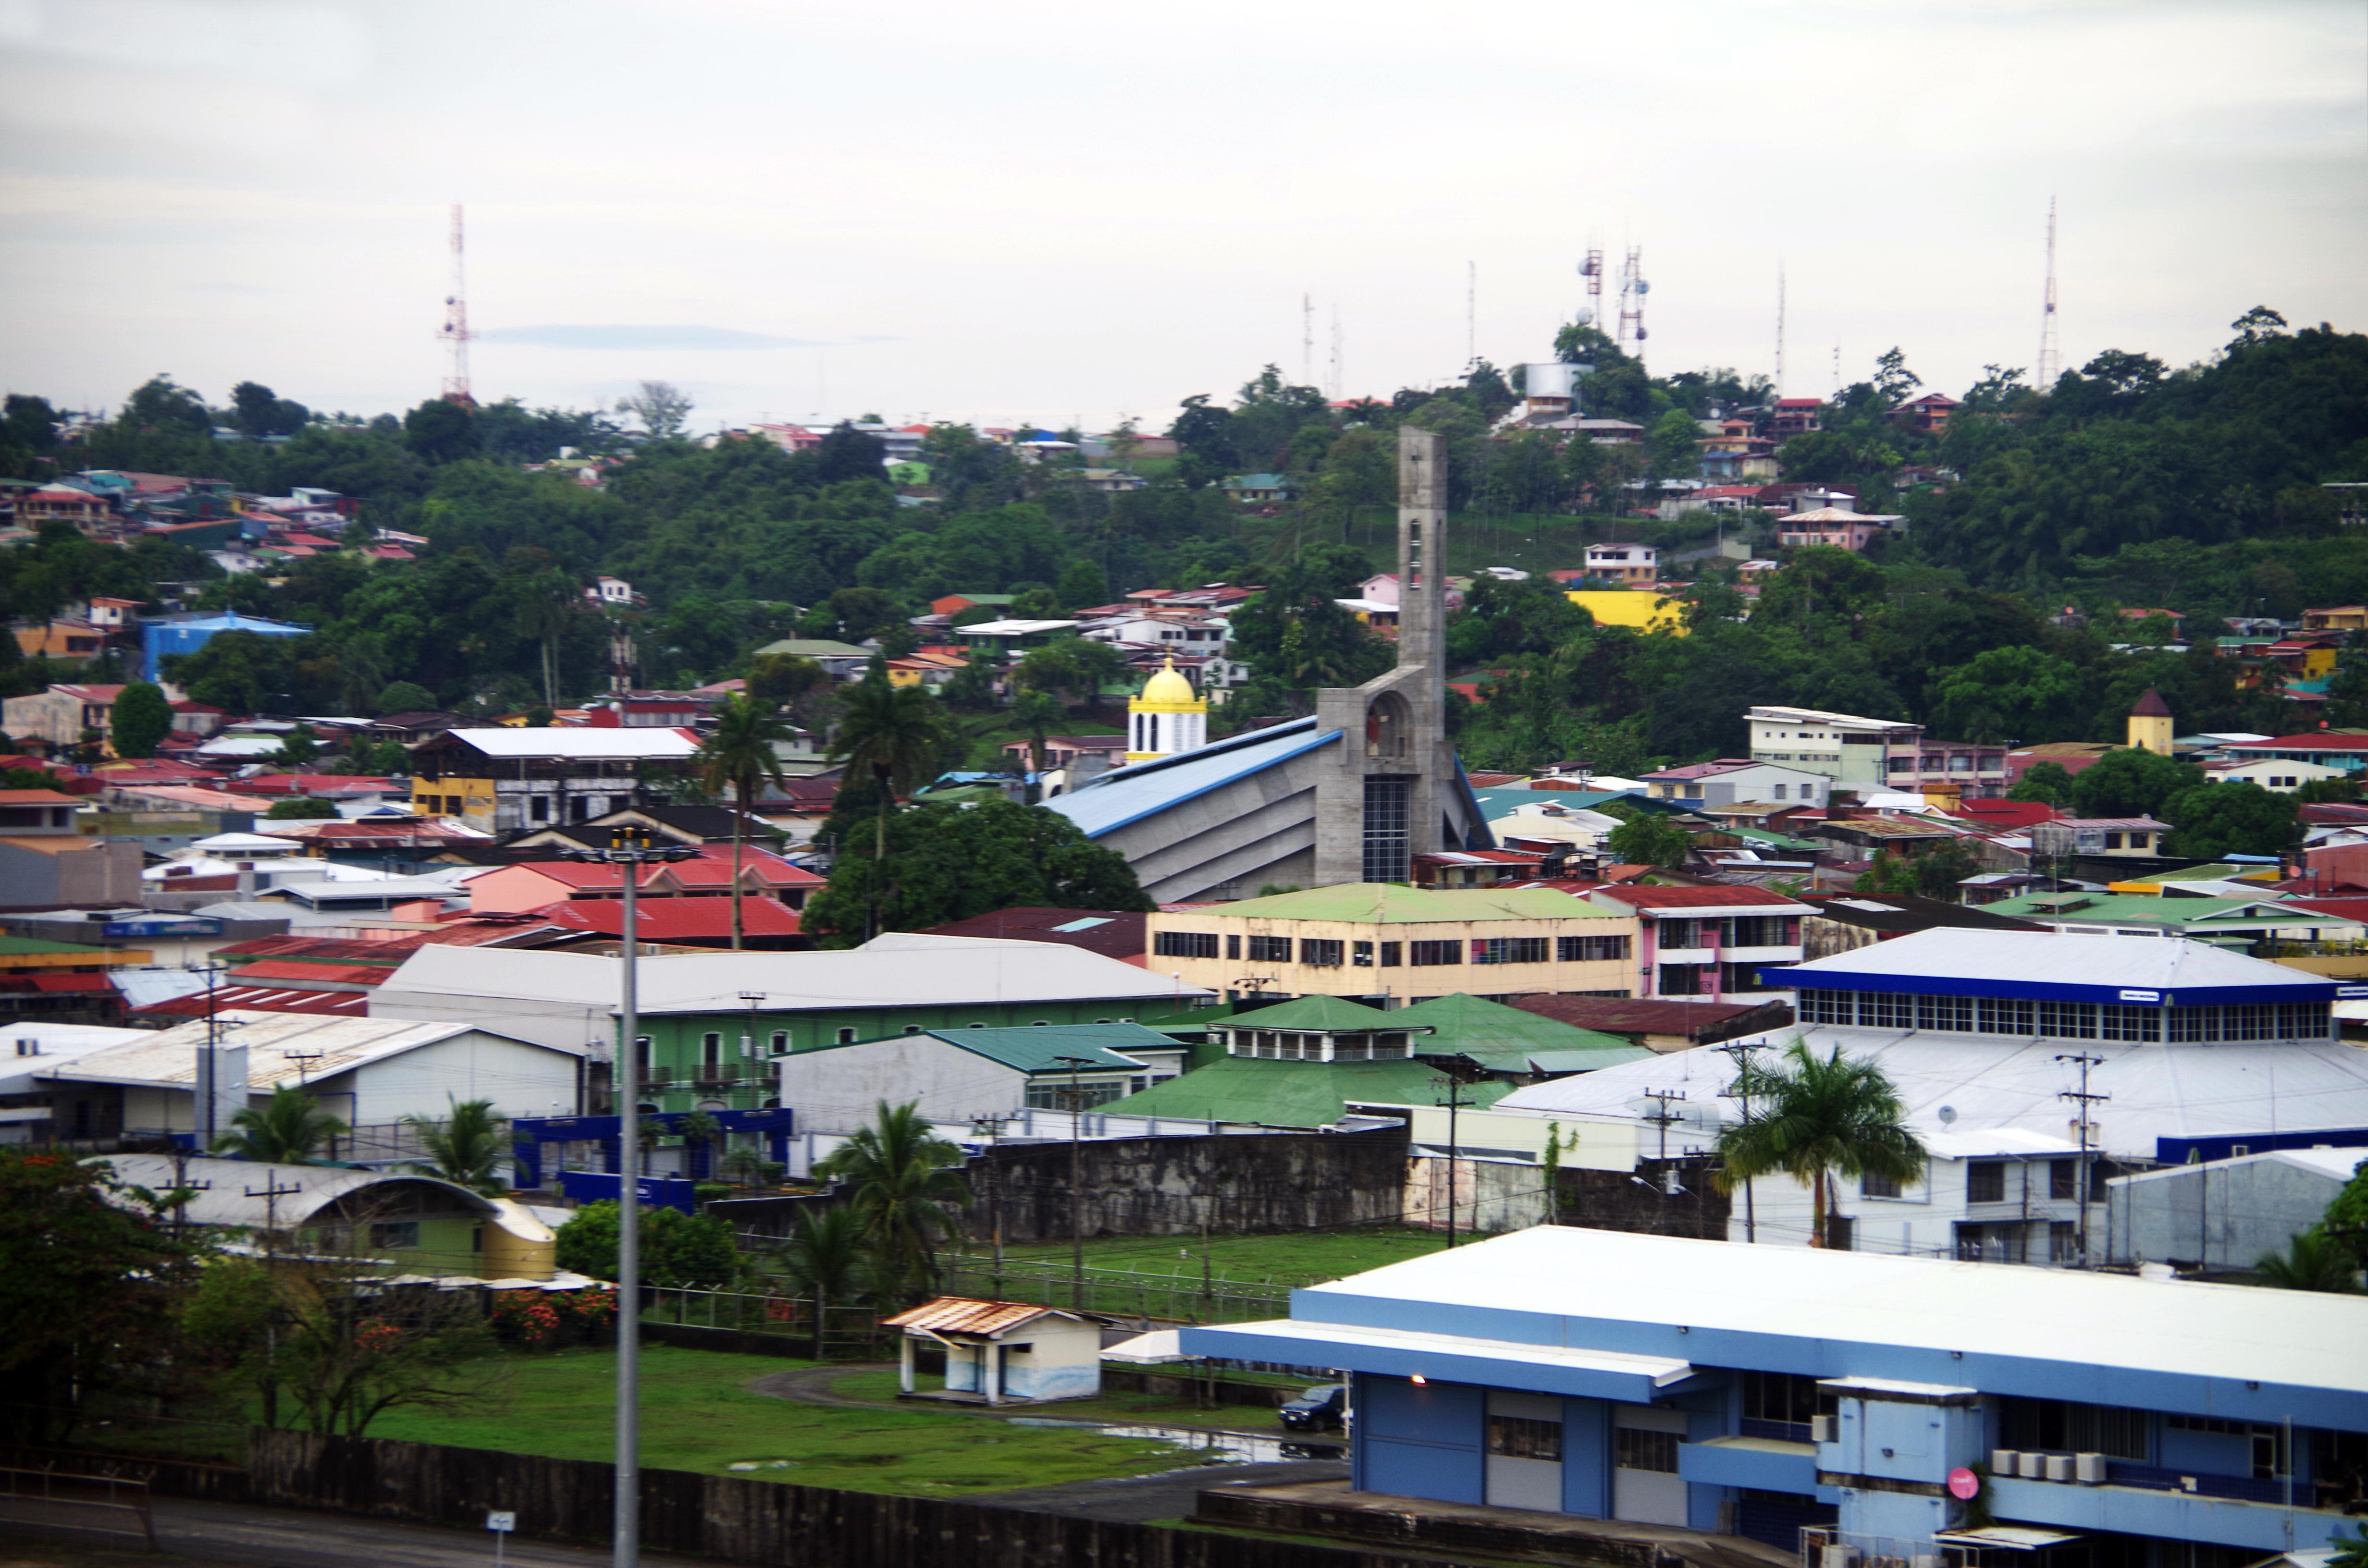 Puerto Limon Reisefuhrer Auf Wikivoyage